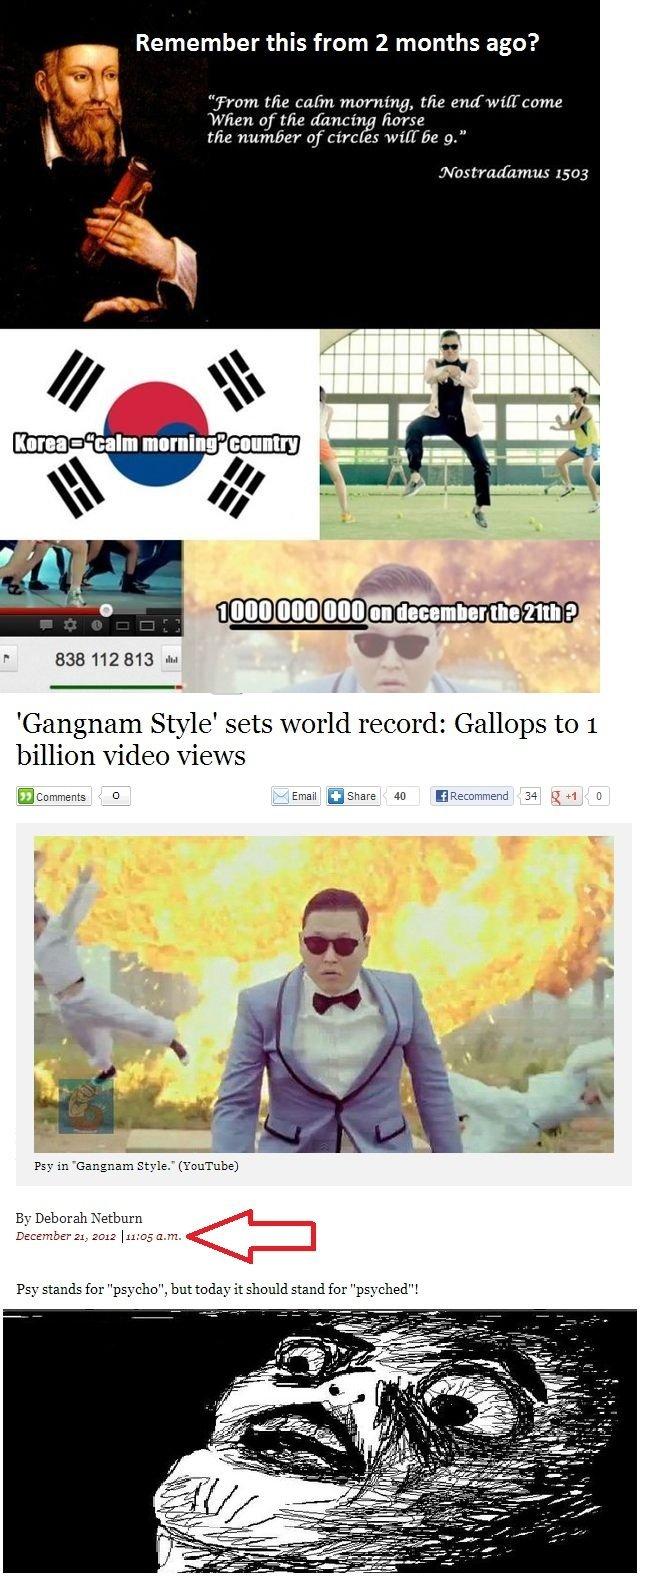 "1 billion views!. internet prophecy: fulfilled. ara' l' ibrl' ' lerl this Hem 2 months as :3? ille MINI, !tsmall P 1333112313 "" Gangnam Style' sets world record 1 billion views! internet prophecy: fulfilled ara' l' ibrl' ' lerl this Hem 2 months as :3? ille MINI !tsmall P 1333112313 "" Gangnam Style' sets world record"